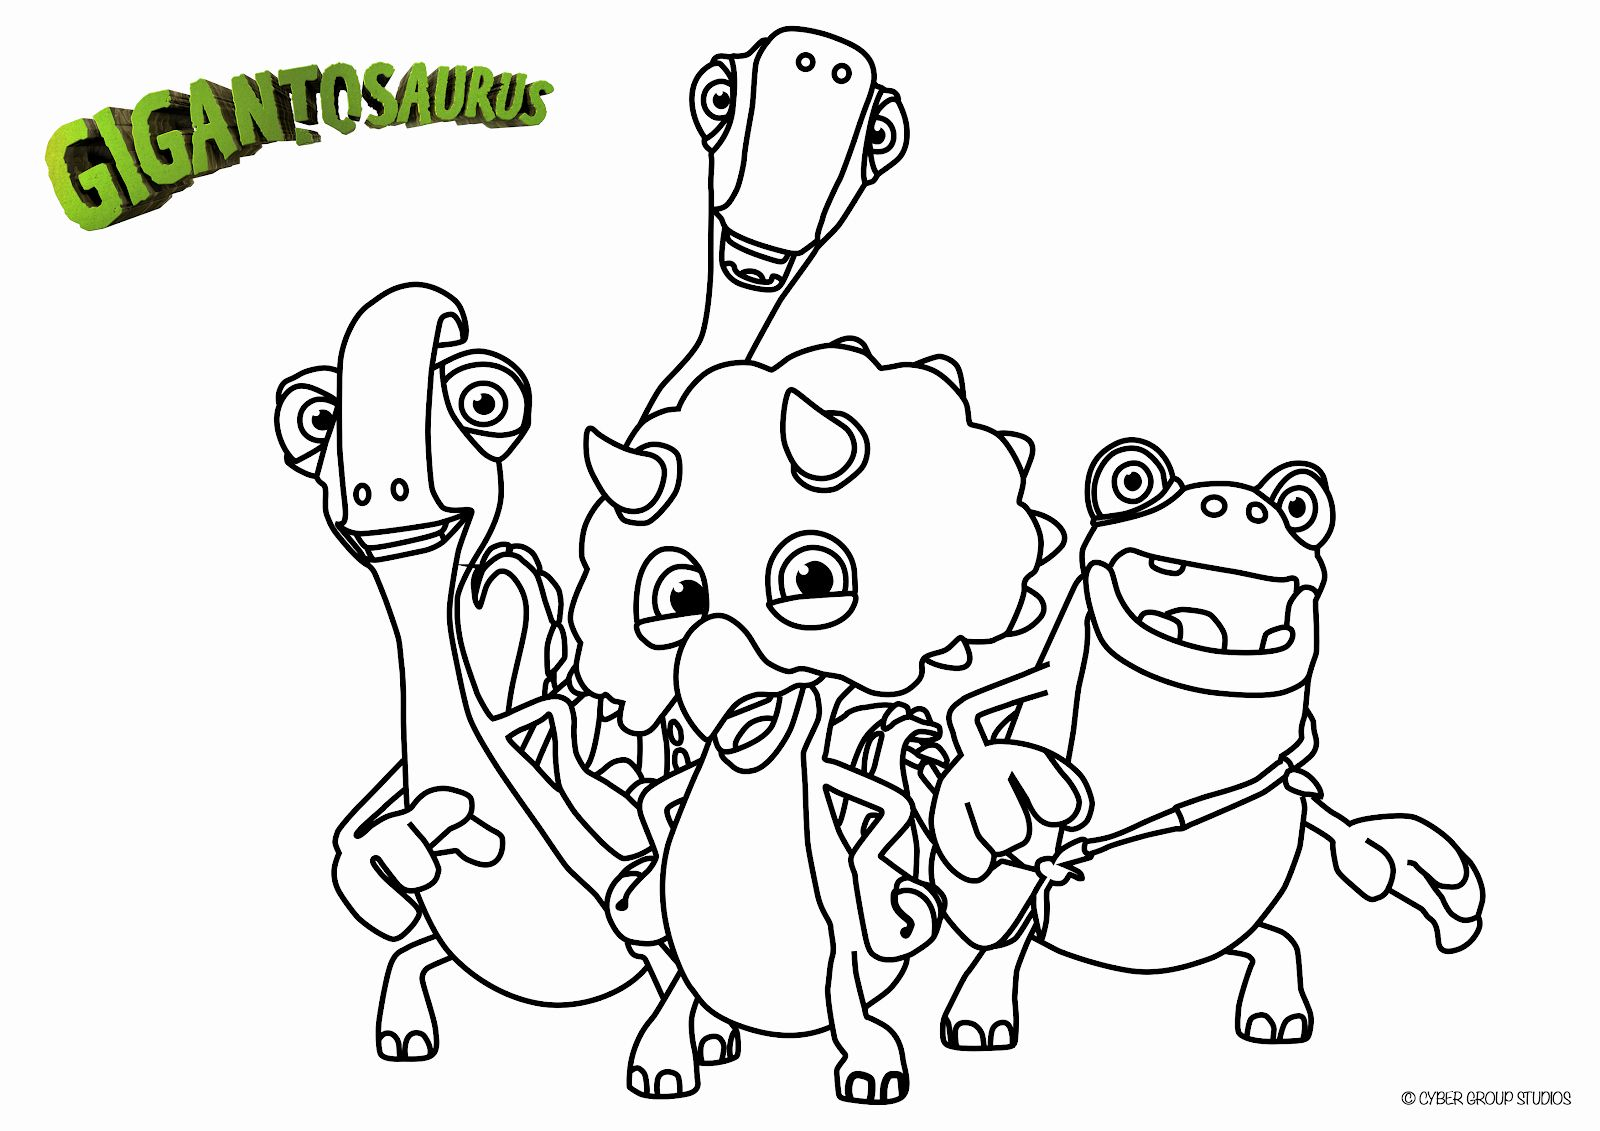 Disney Junior Coloring Book Awesome Gigantosaurus On Disney Junior Free Printables In 2020 Coloring Pages Unicorn Coloring Pages Mermaid Coloring Pages